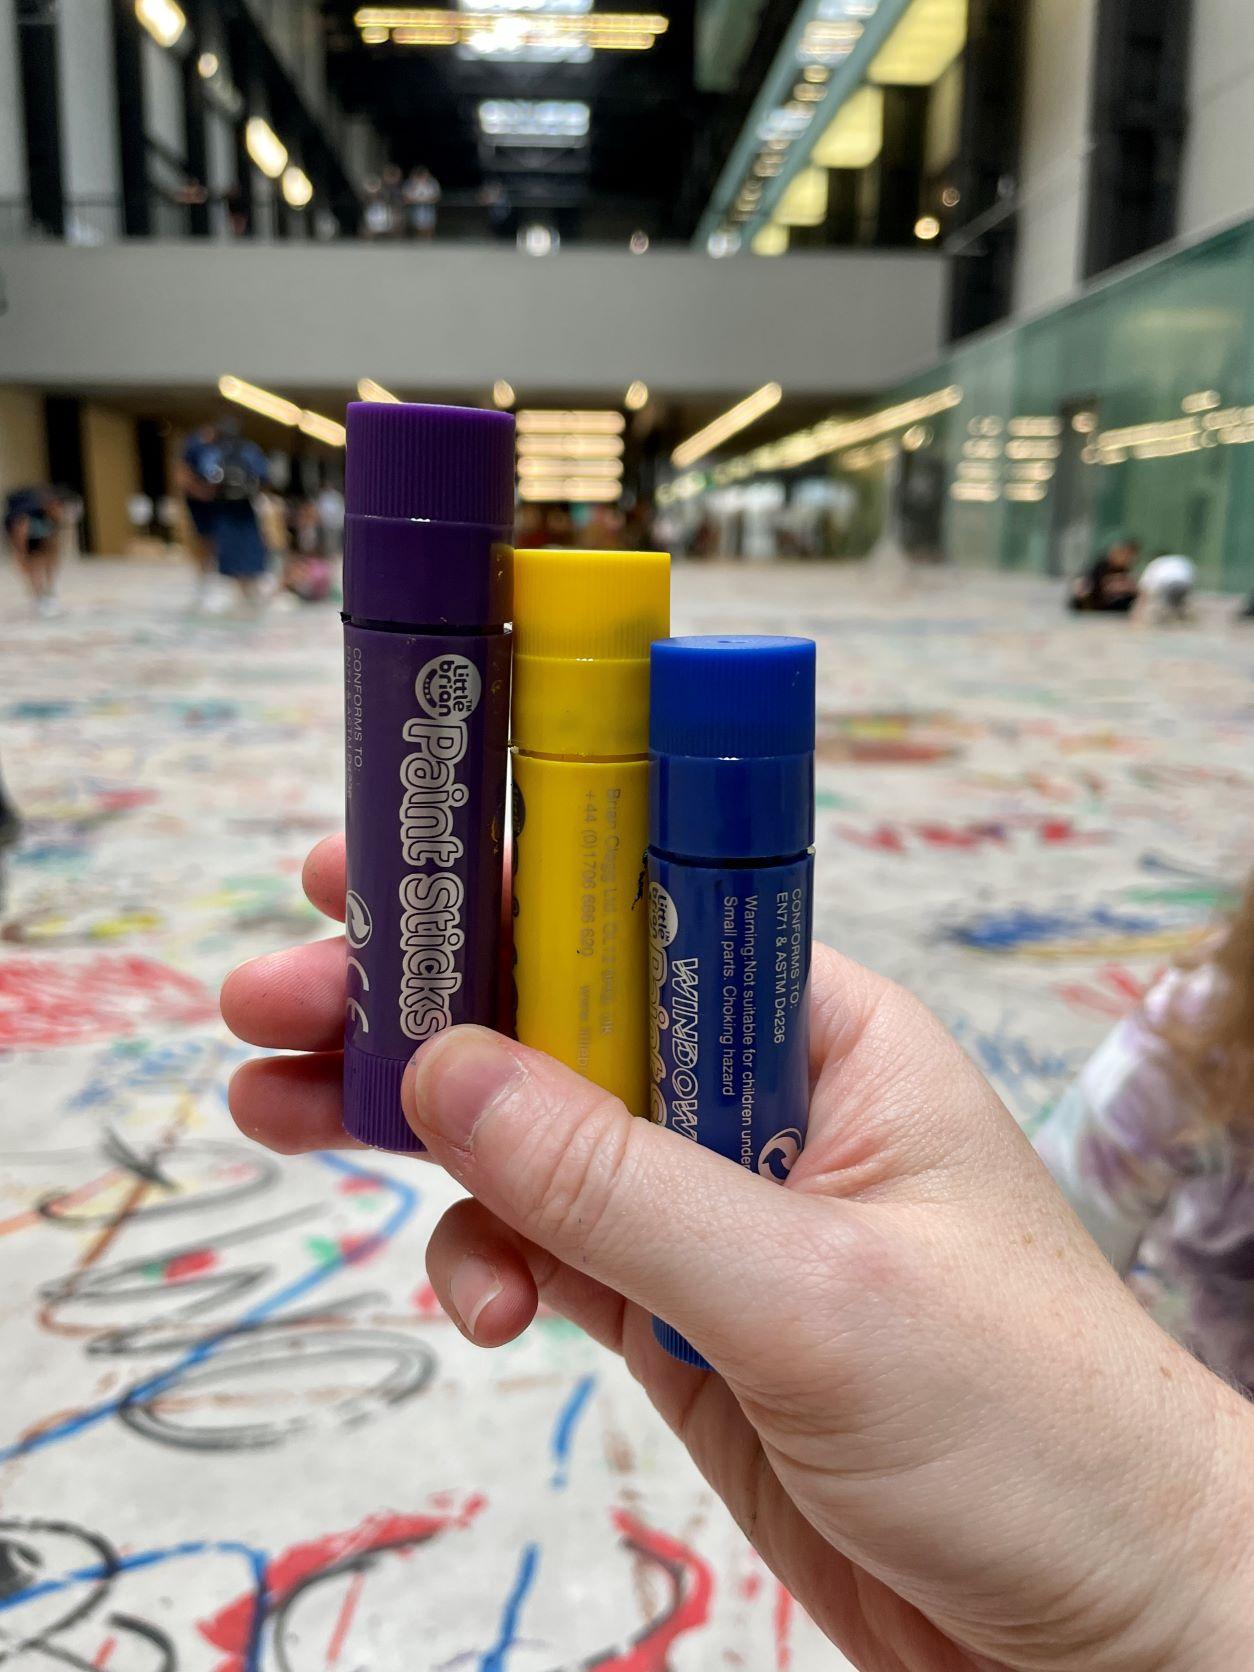 Mega Please Draw Freely crayons